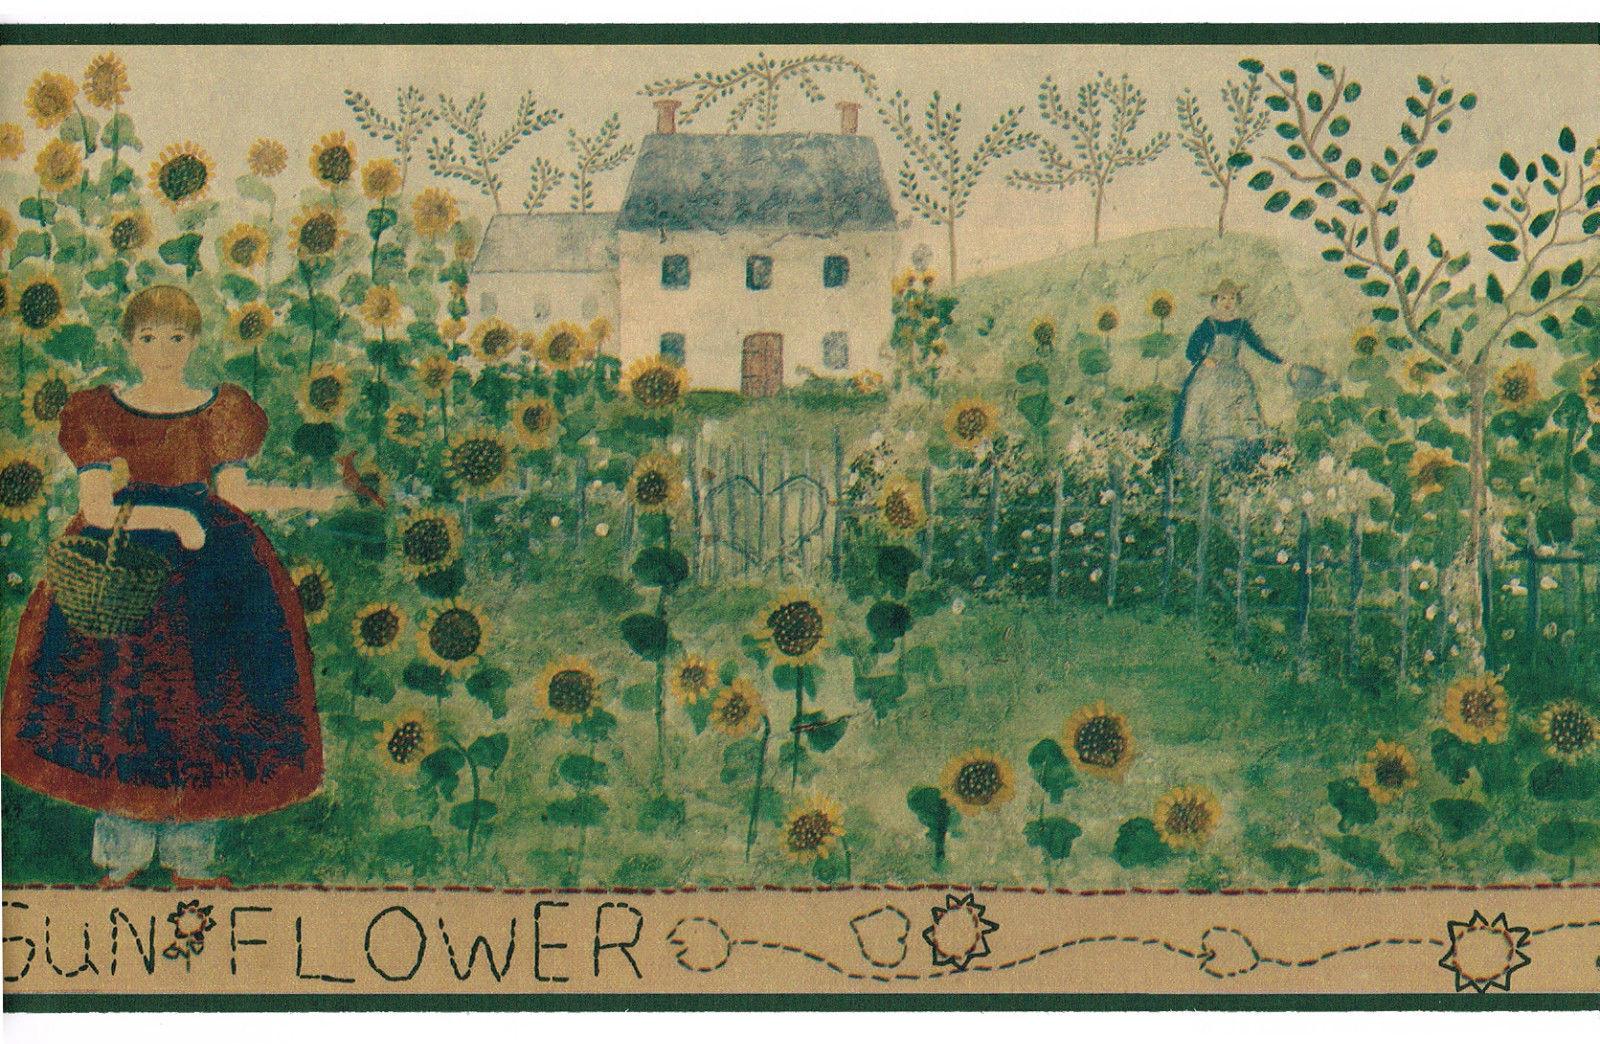 Field Garden Country Vintage Primitive Folk Art Green Wallpaper Border 1600x1044